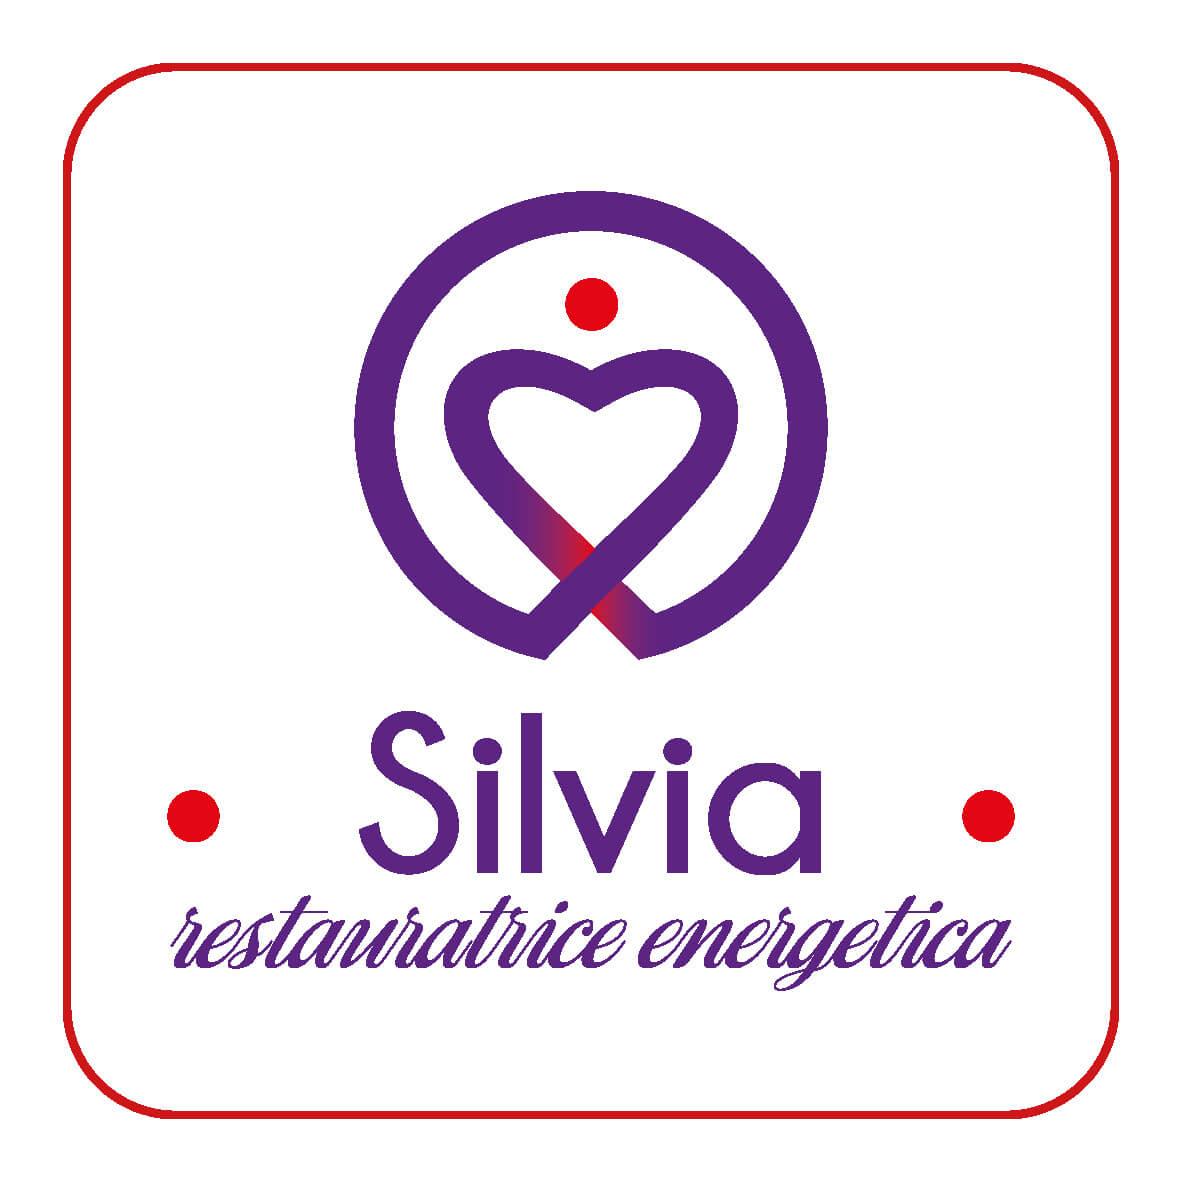 Silvia Restauratrice Energetica